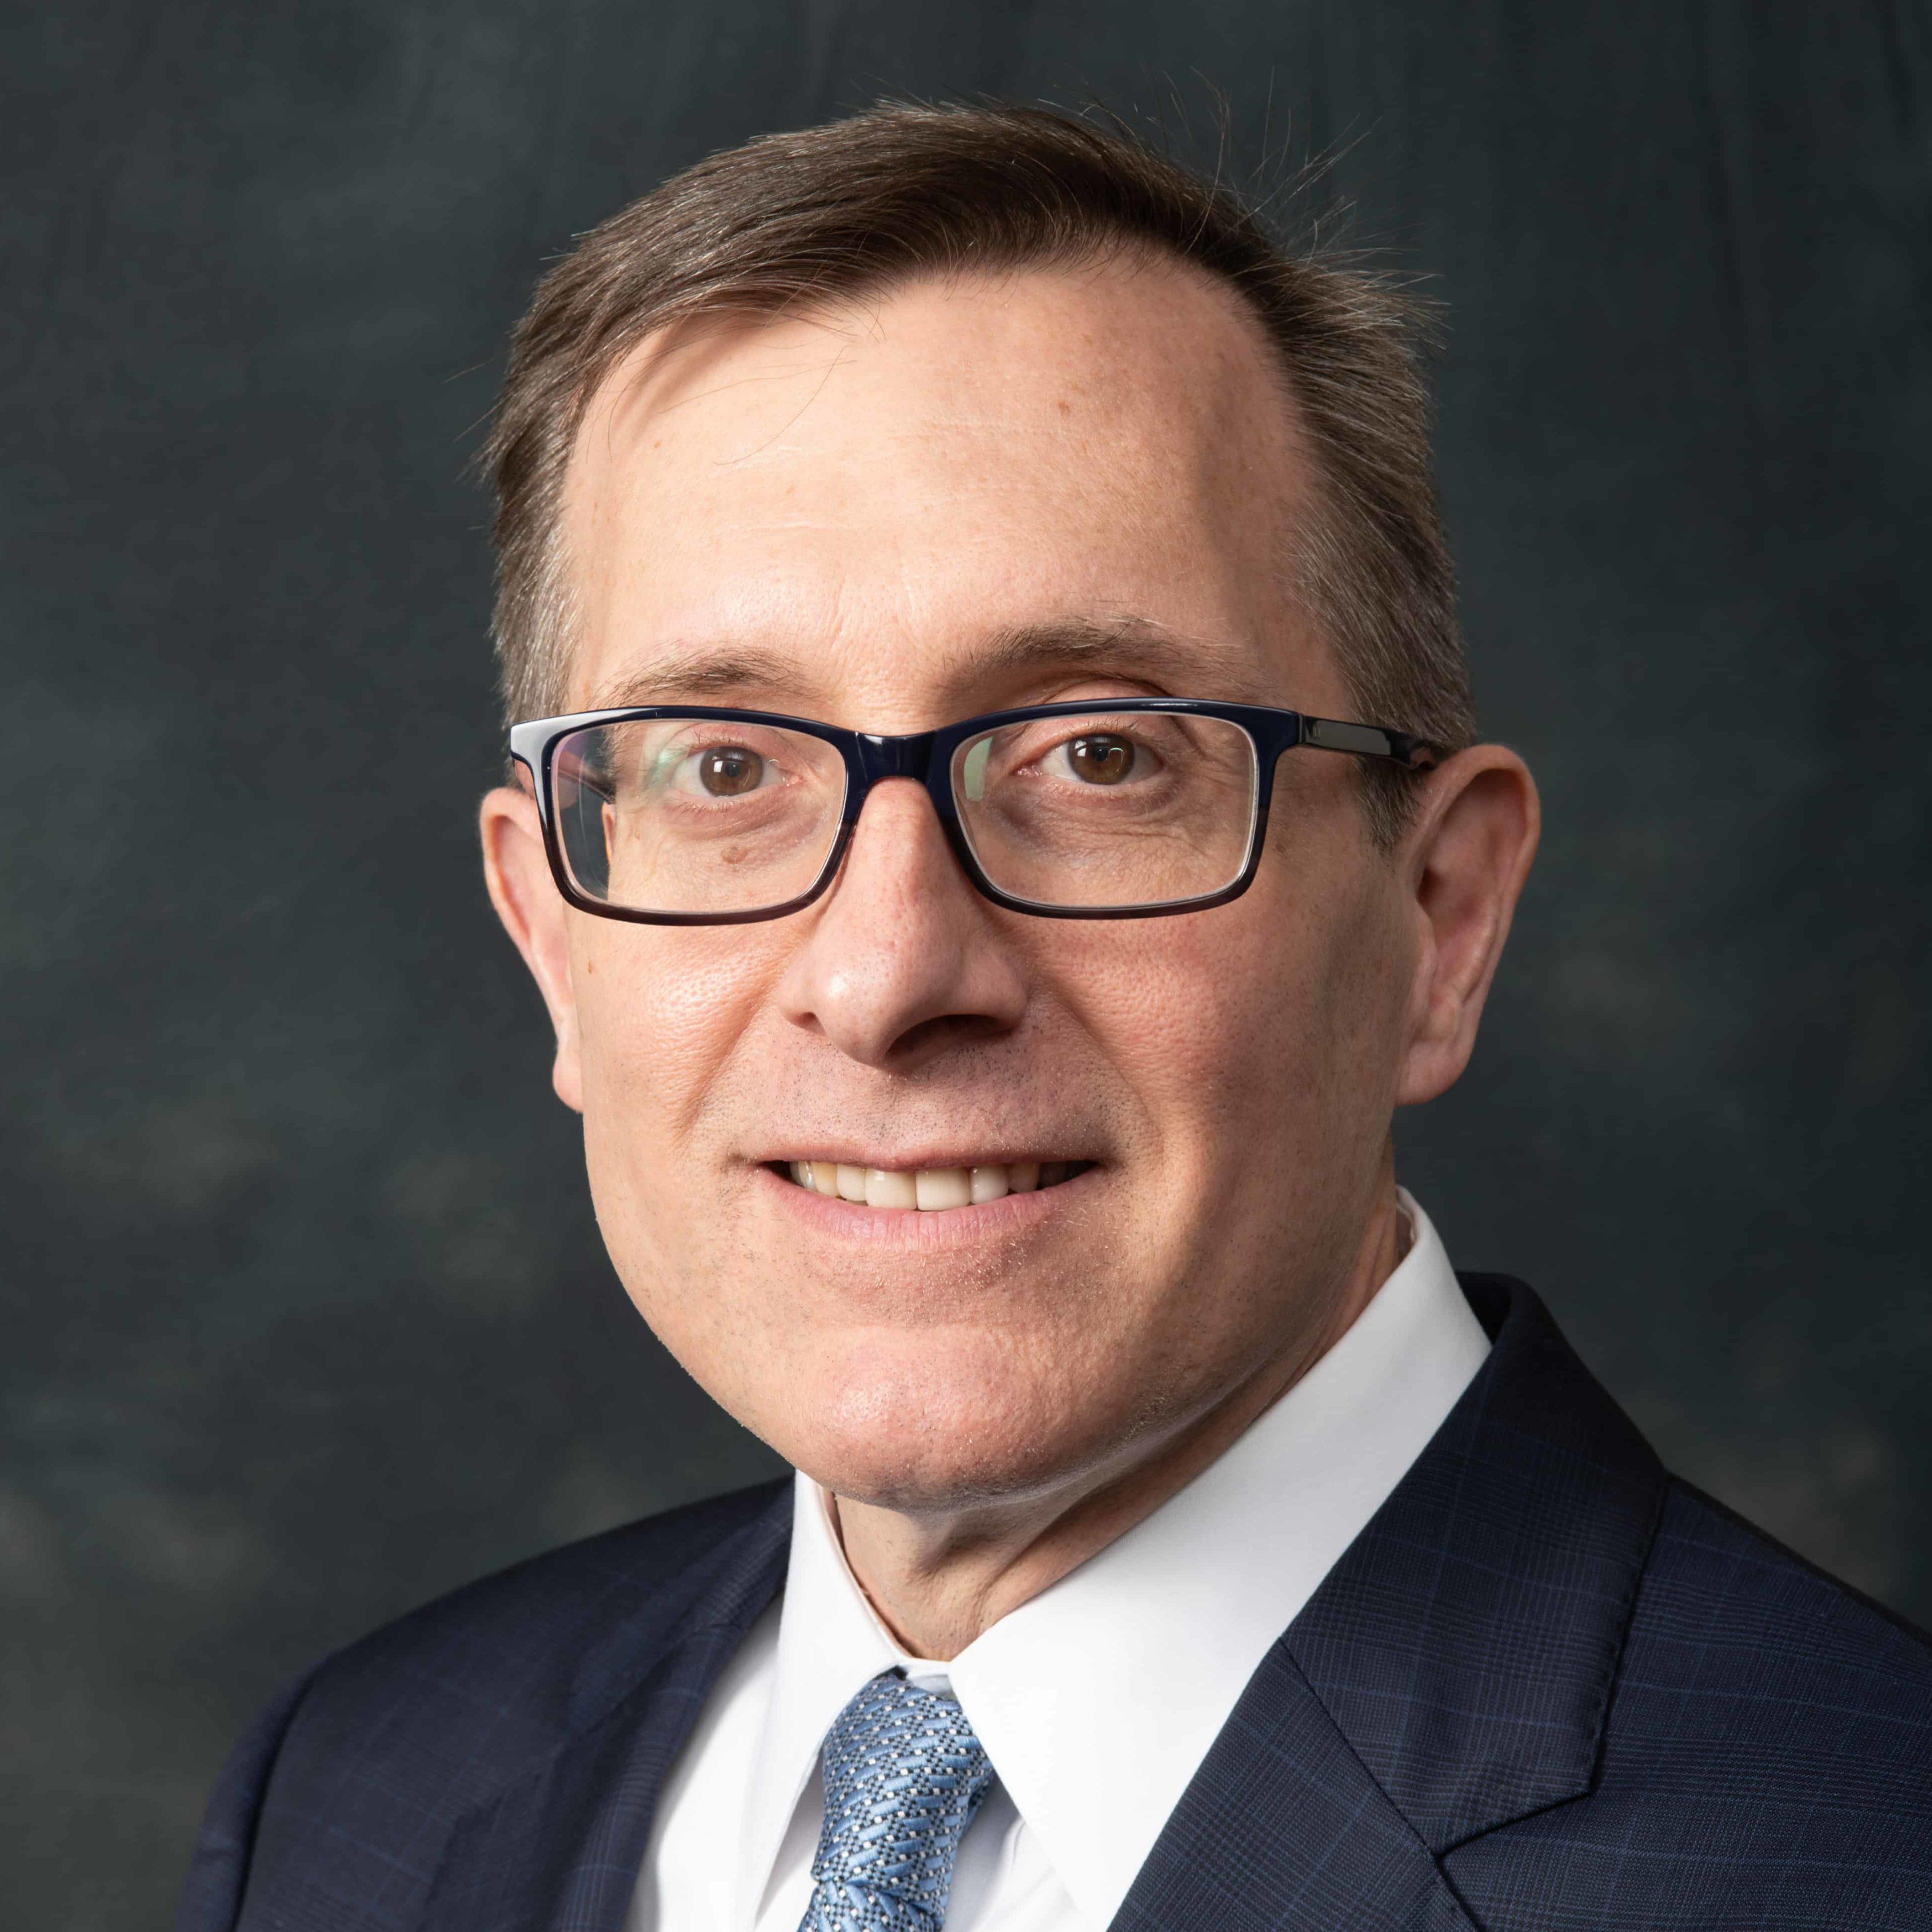 Ronald P. DeMatteo, MD